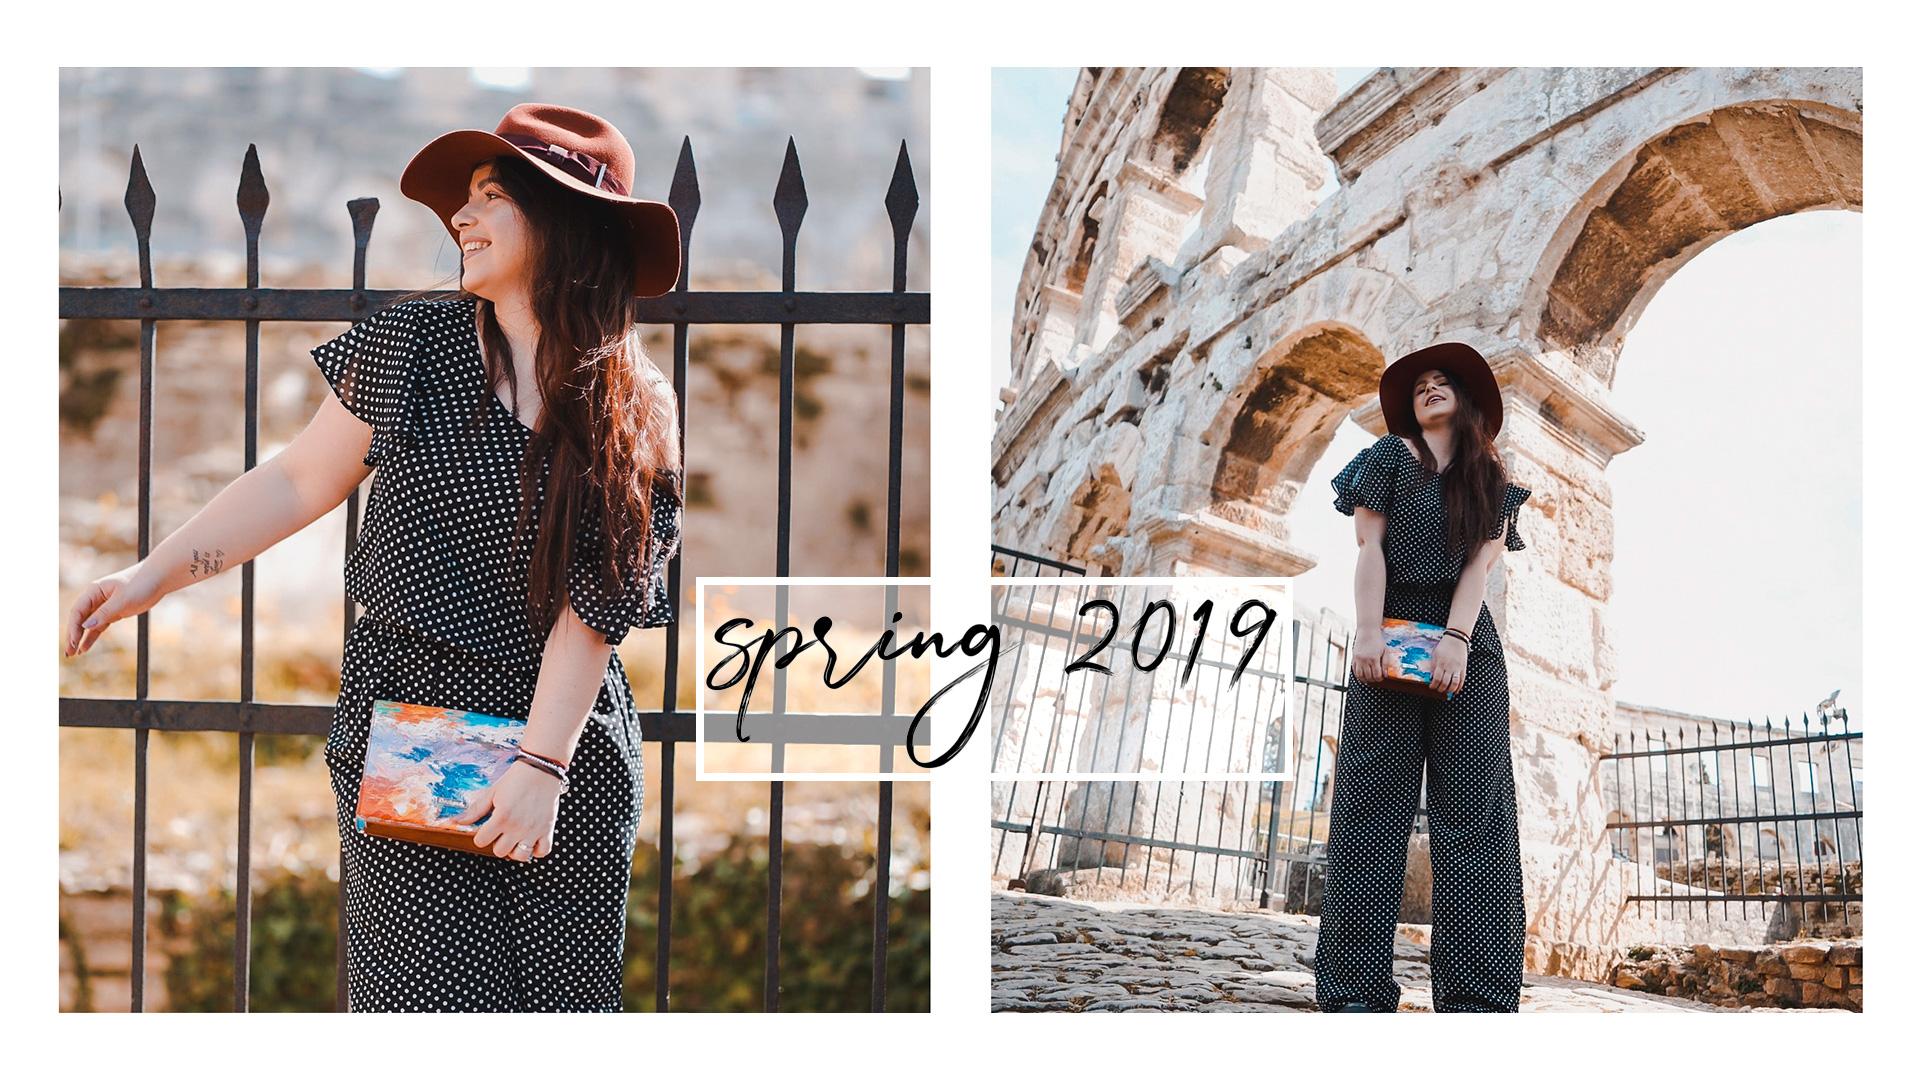 proljece2019_web3